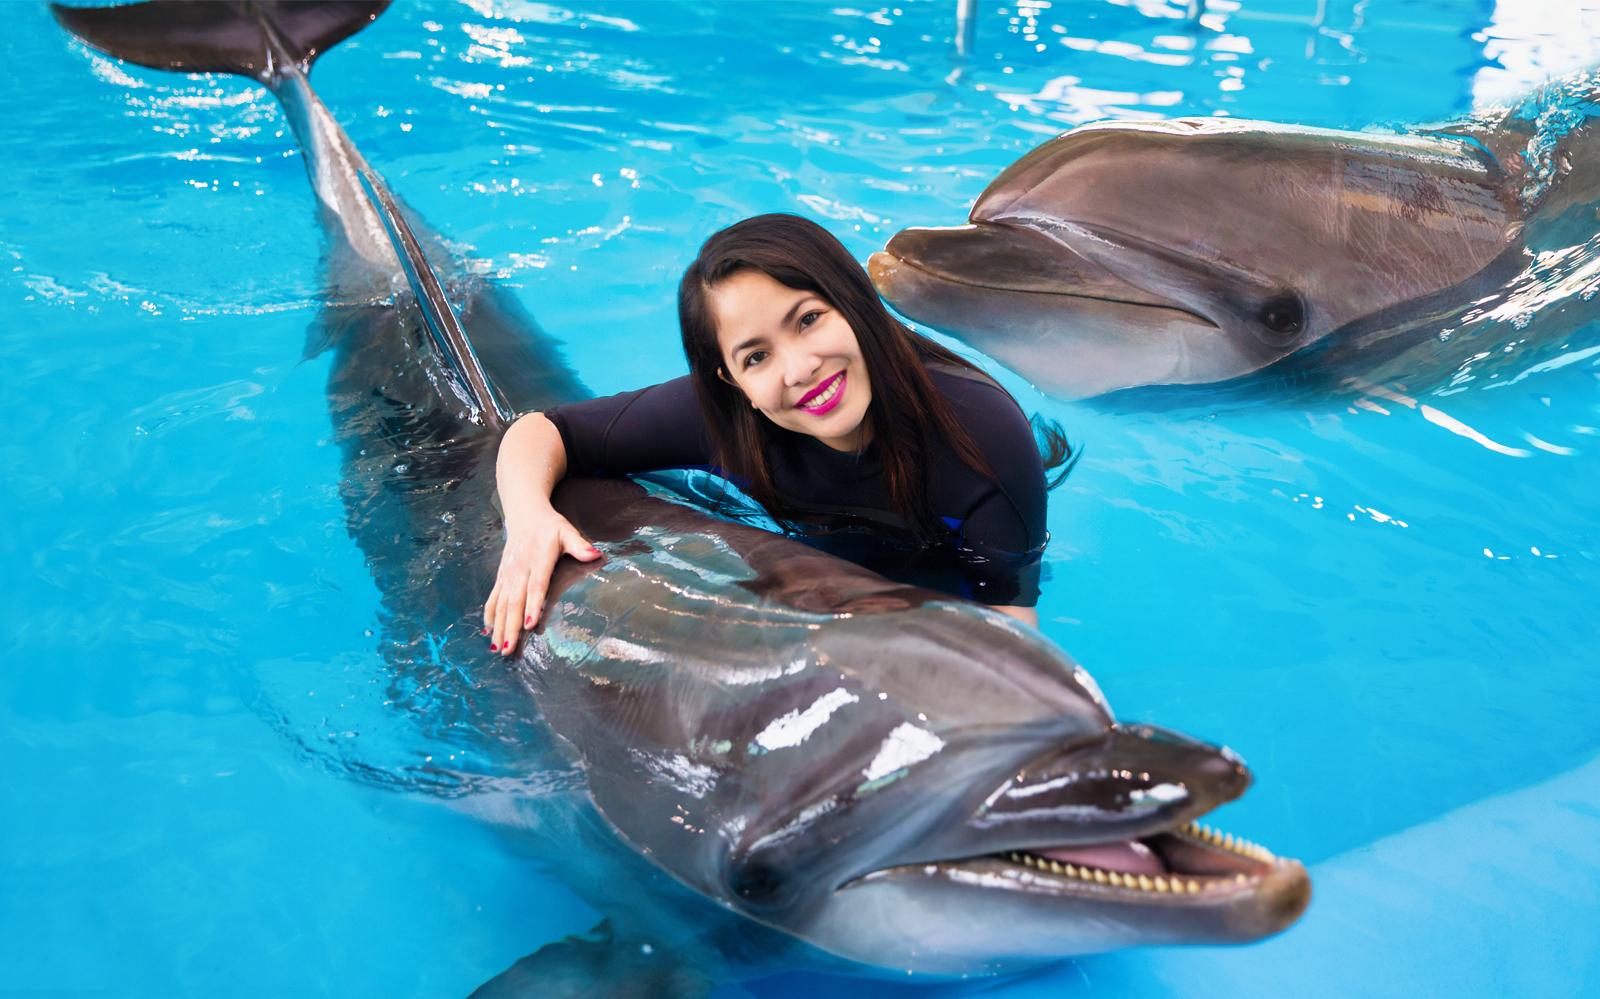 Dubai Aquarium - Transform into a Mermaid